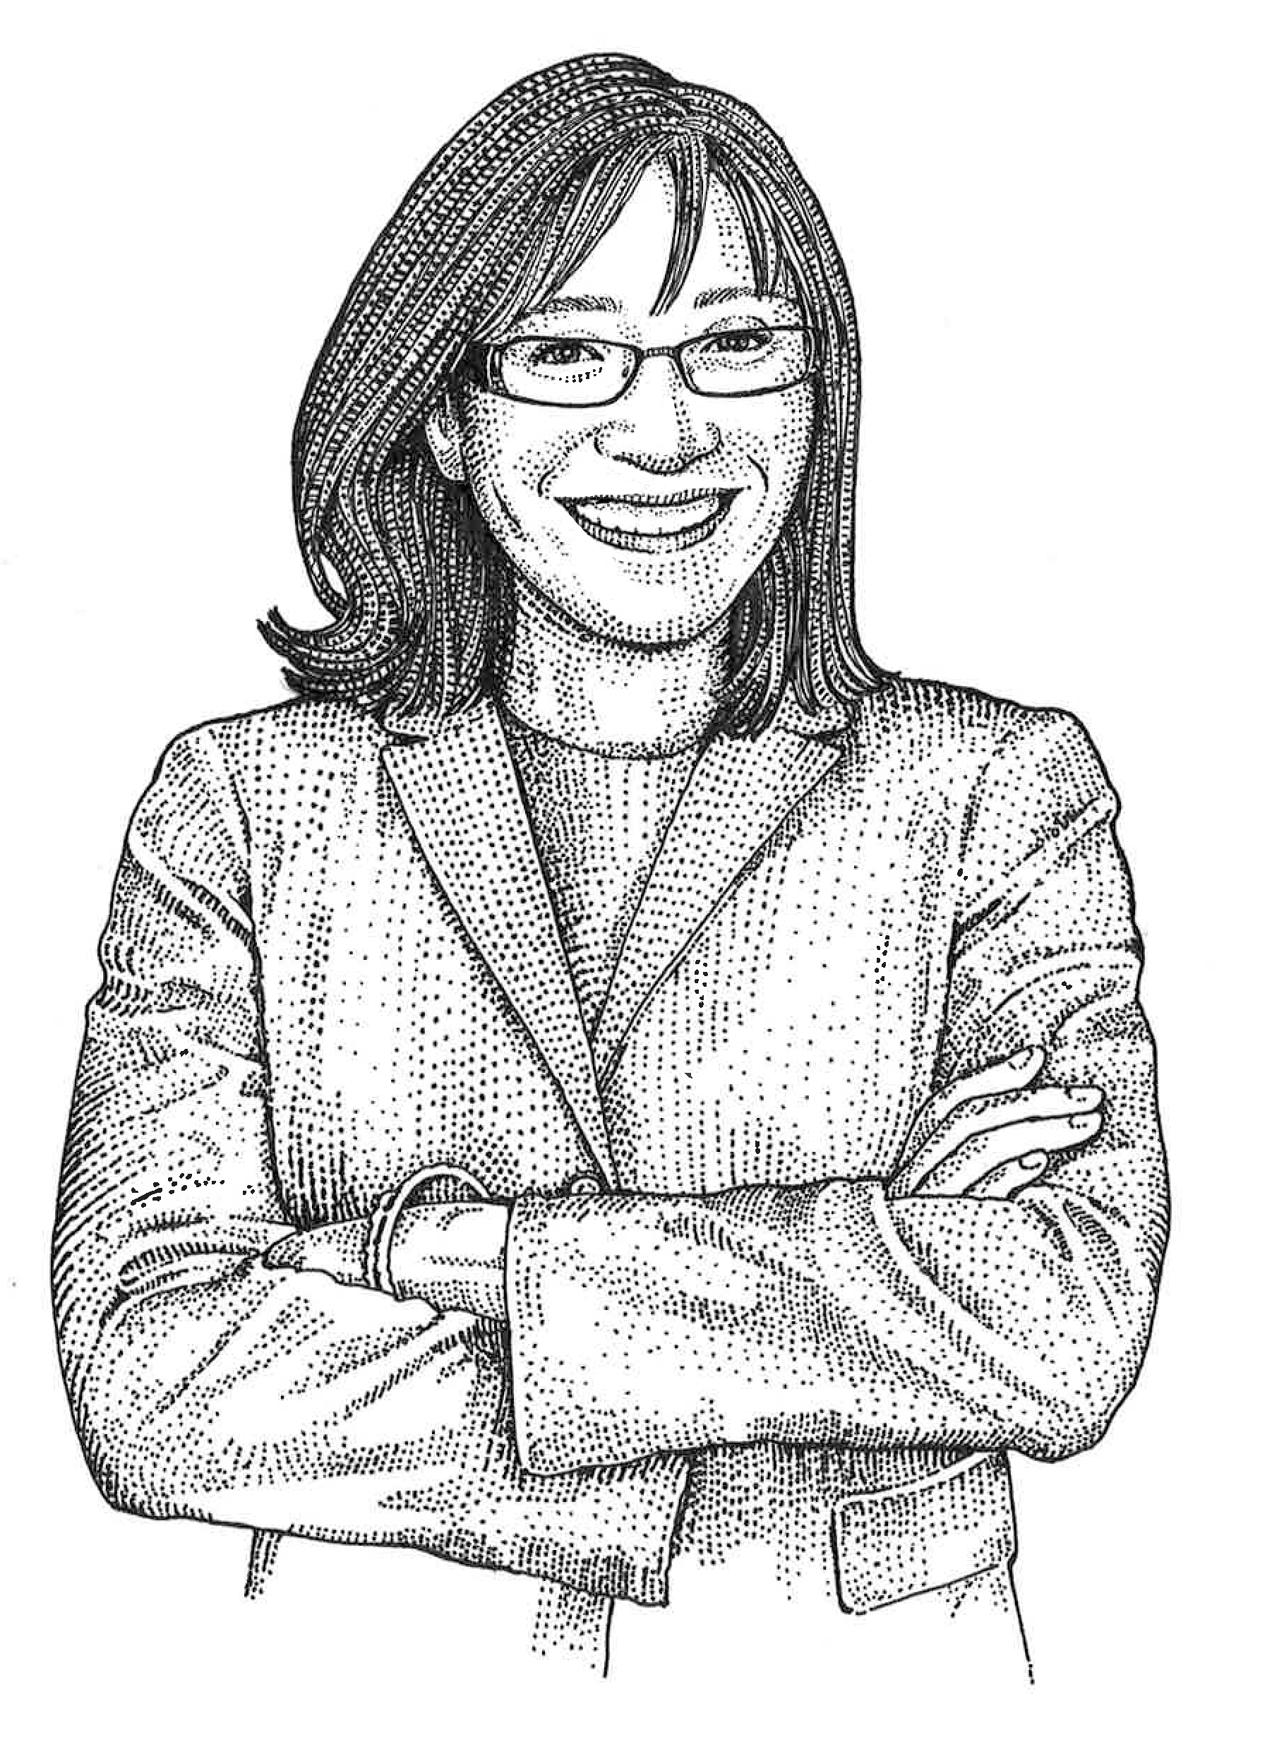 Melanie Pelayo